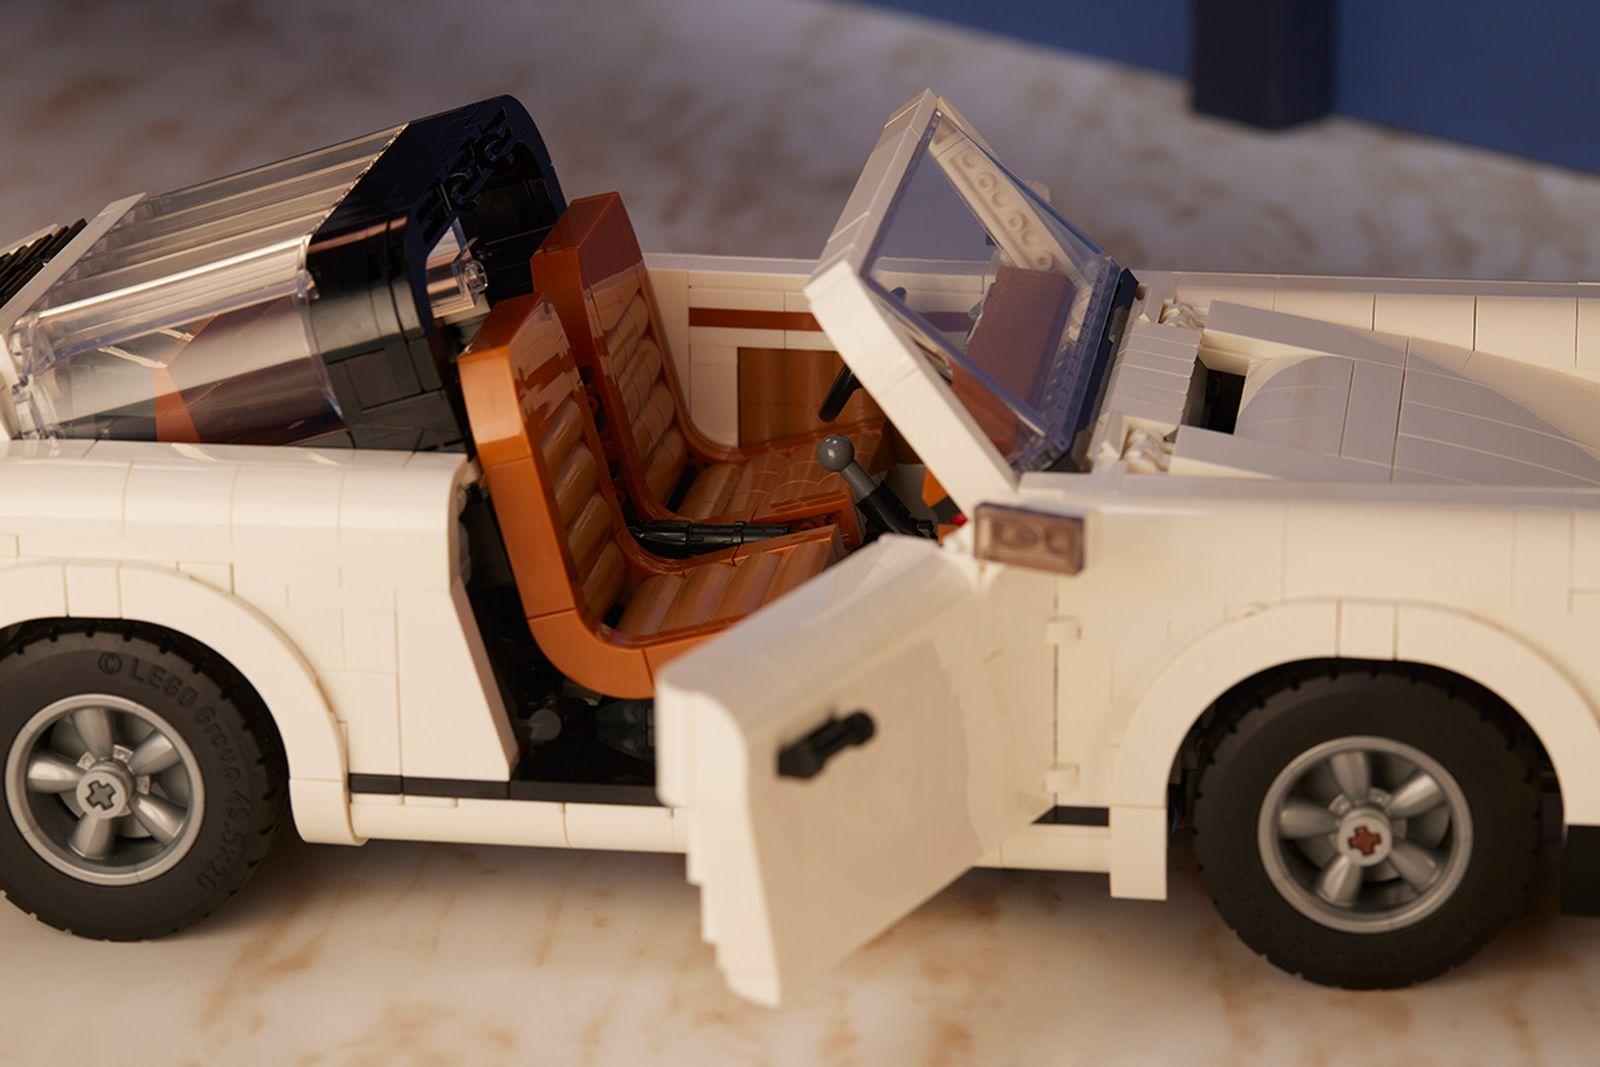 lego-porsche-911-turbo-911-targa-05